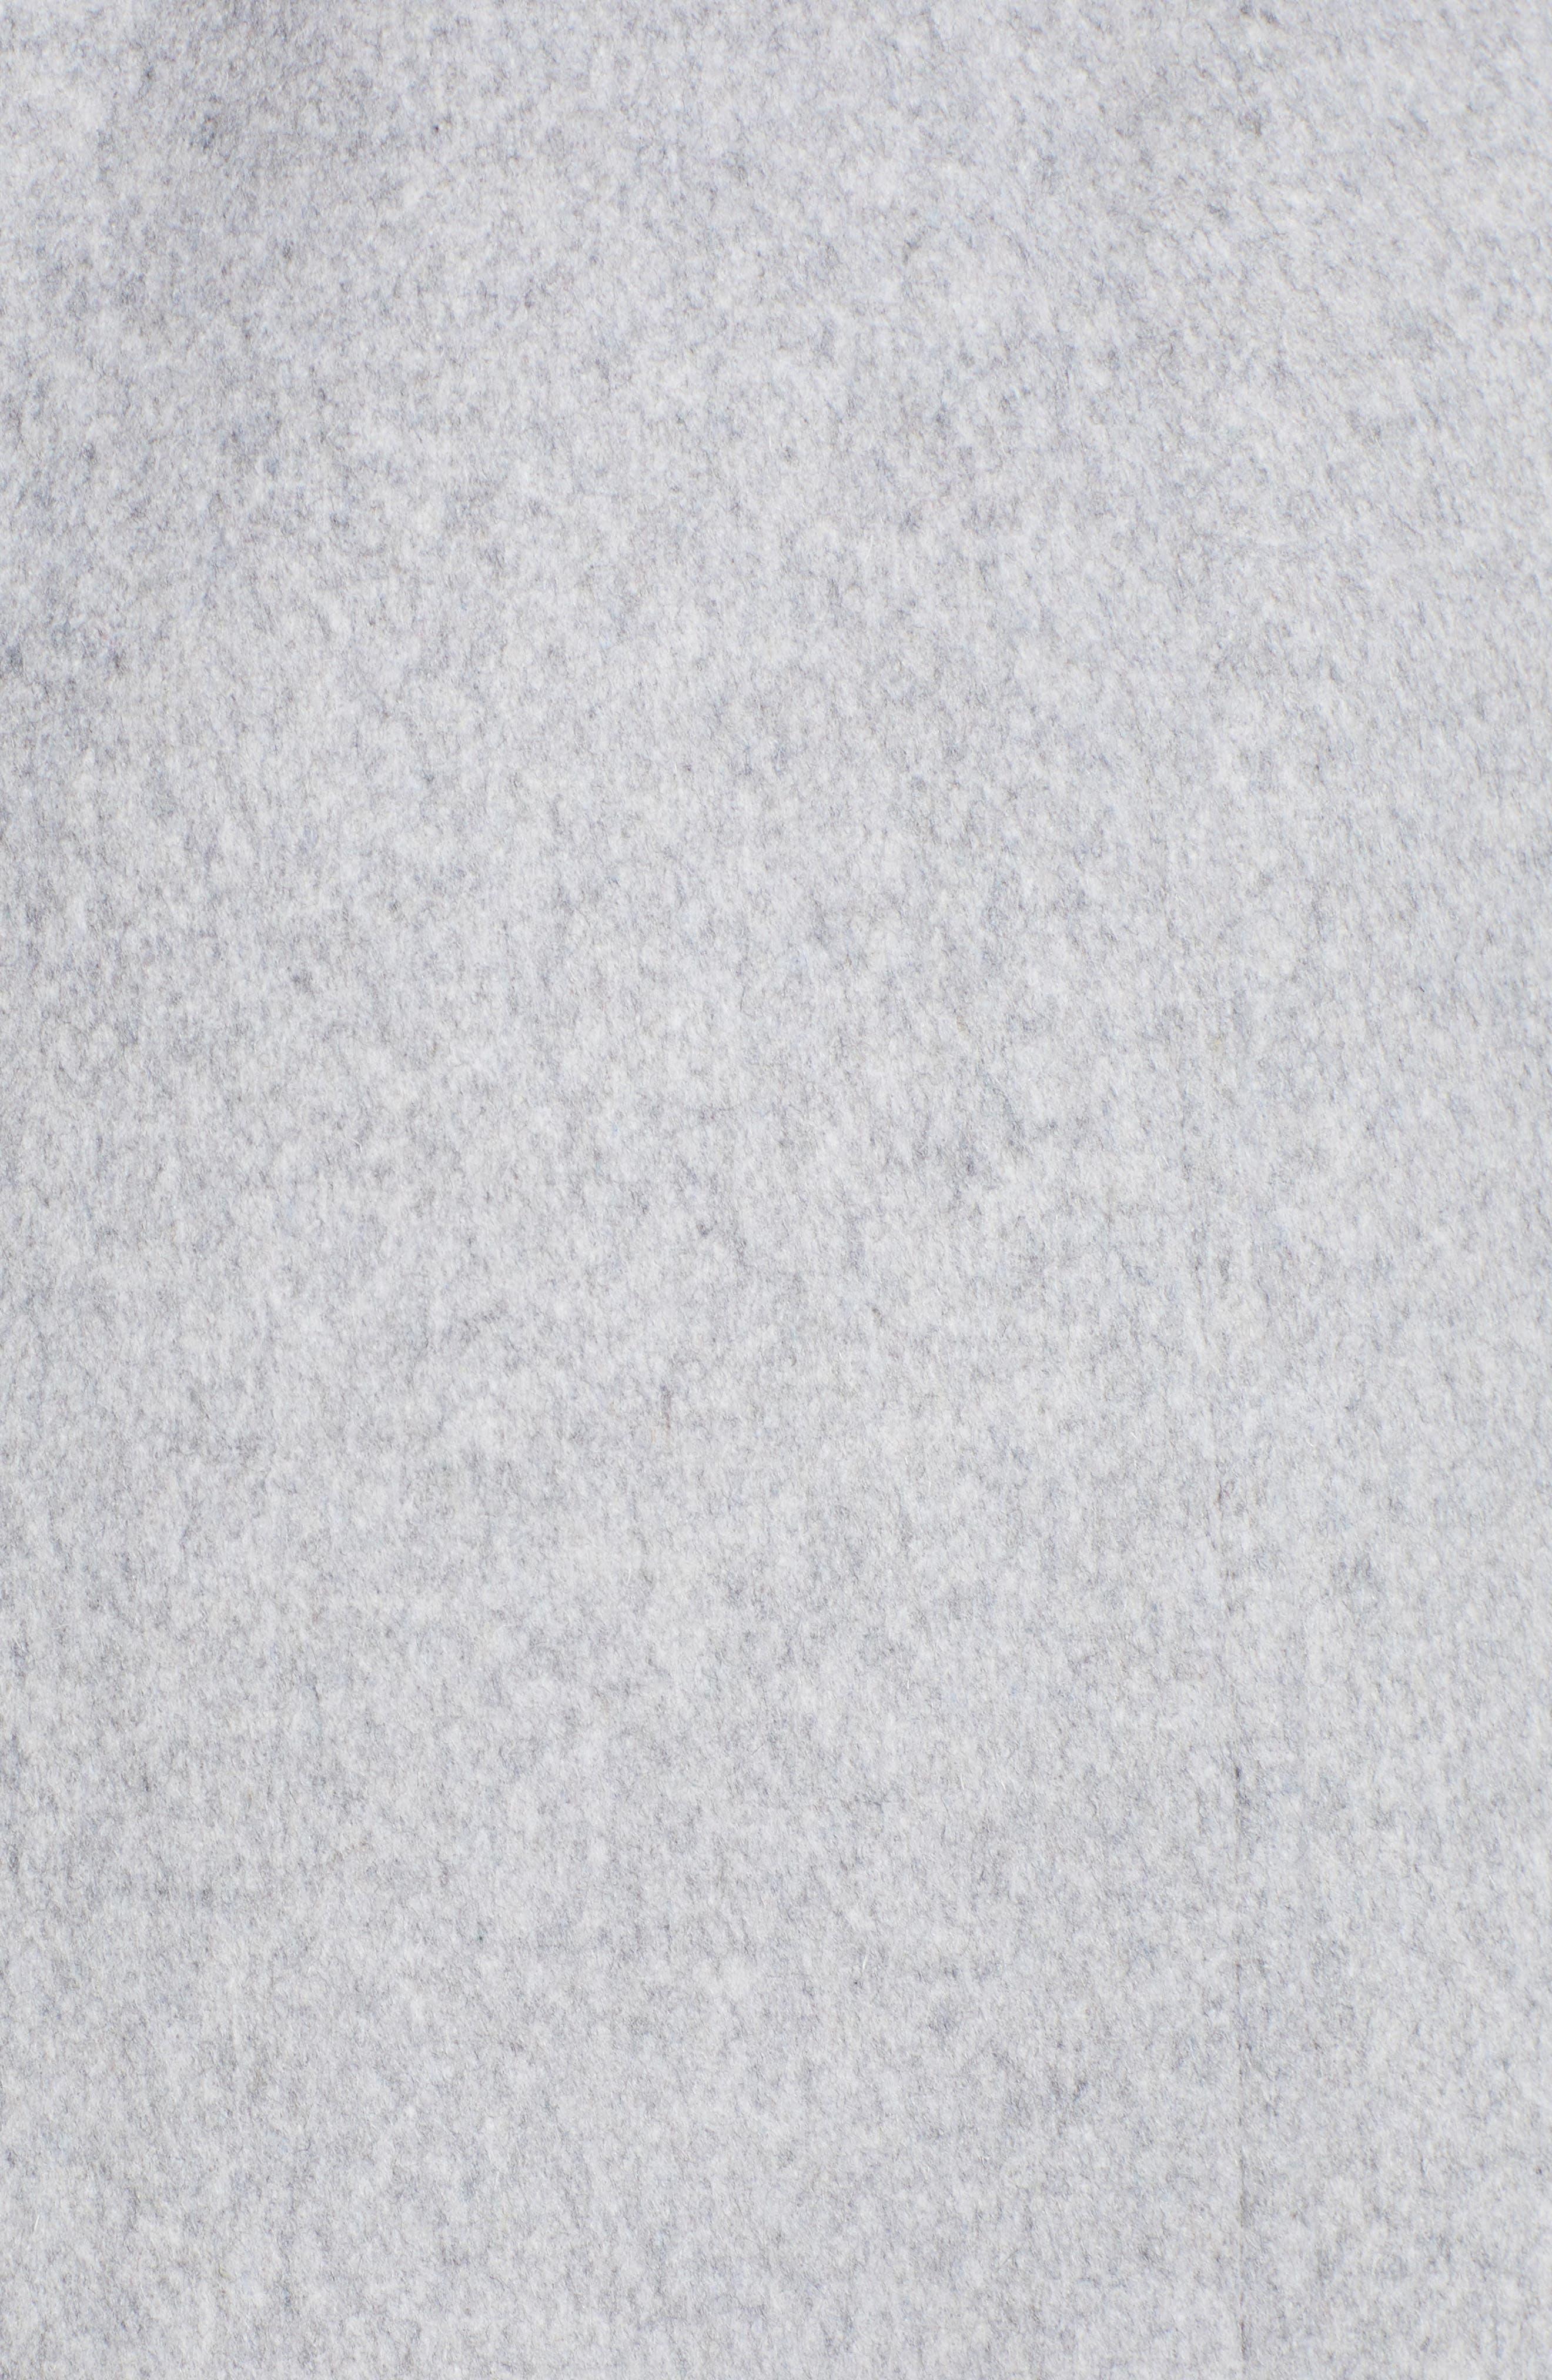 MACKAGE, Nori Belted Wool Blend Coat, Alternate thumbnail 7, color, LIGHT GREY